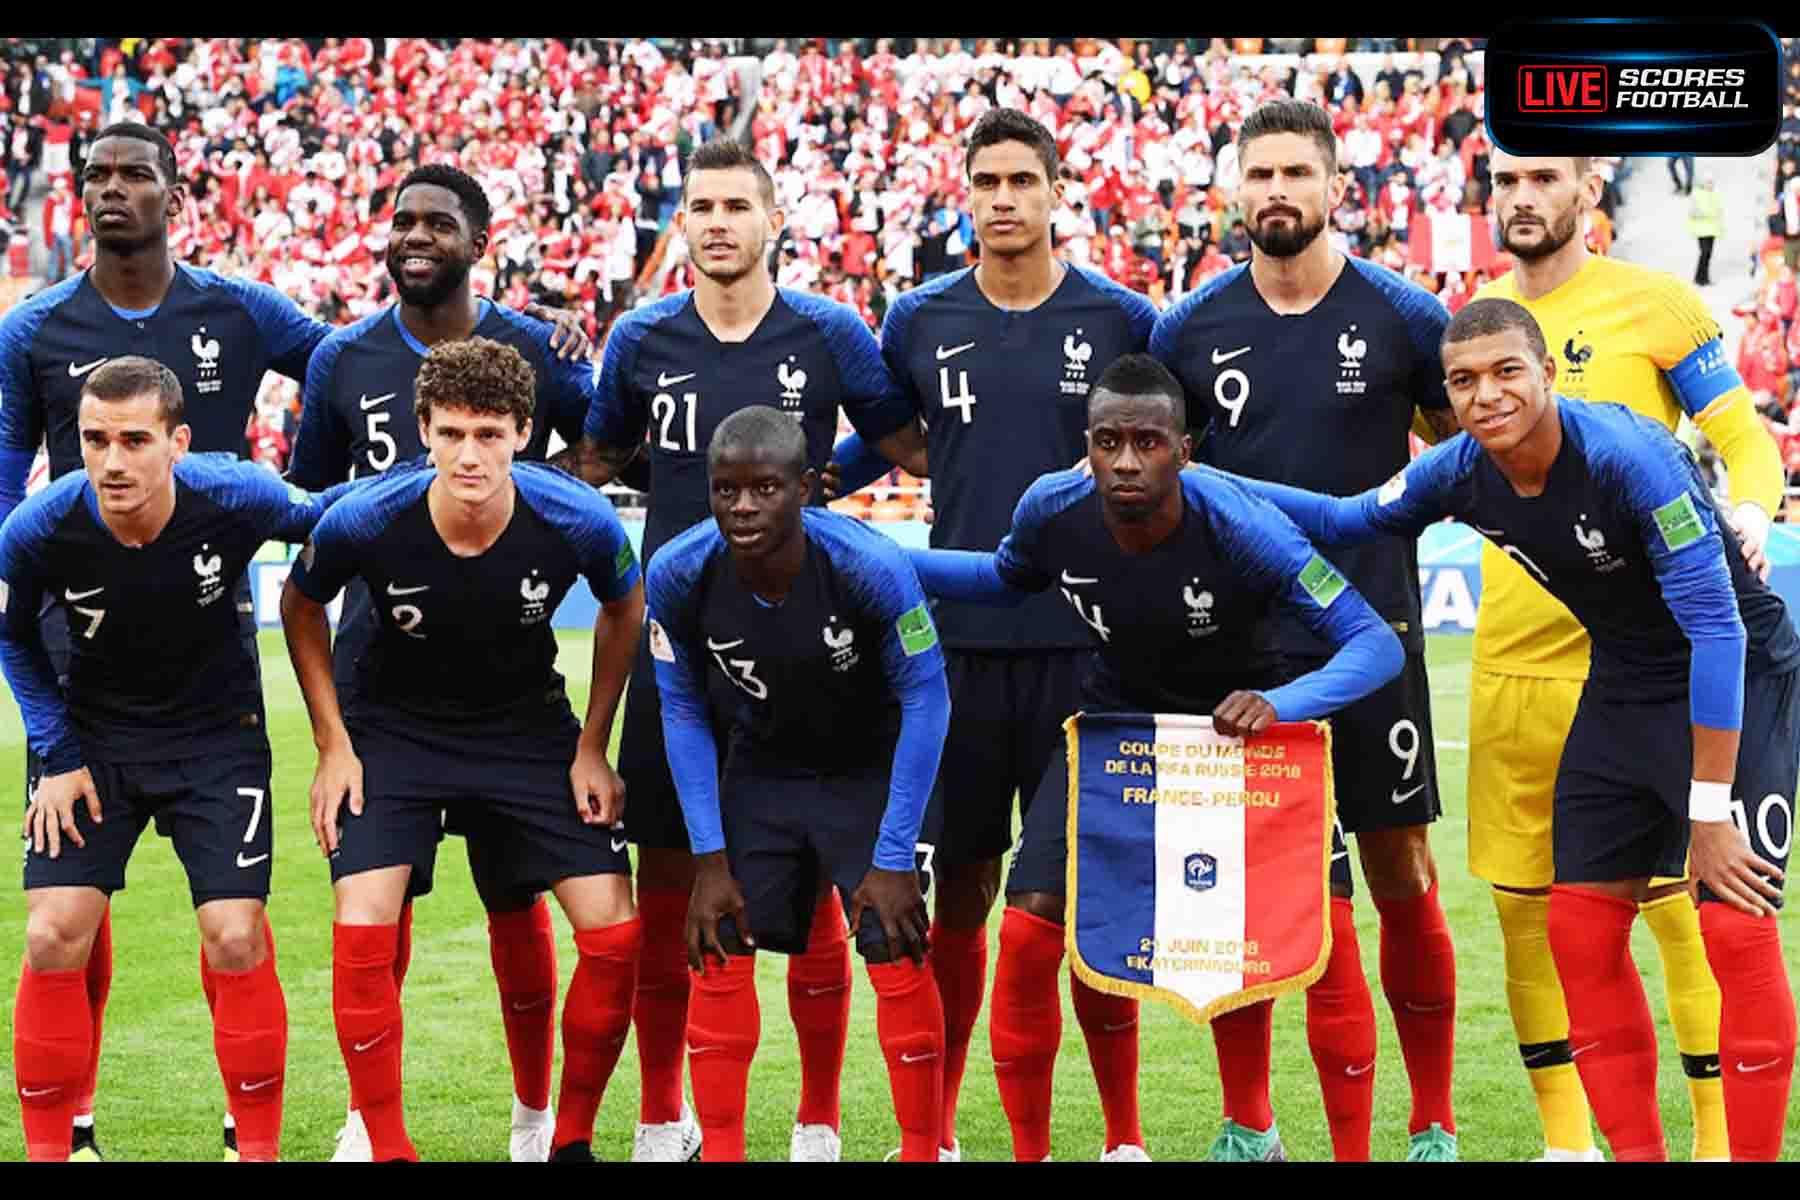 Read more about the article ส่องความพร้อมทีมเต็ง 1 ในยูโร 2020 ทีมชาติฝรั่งเศส